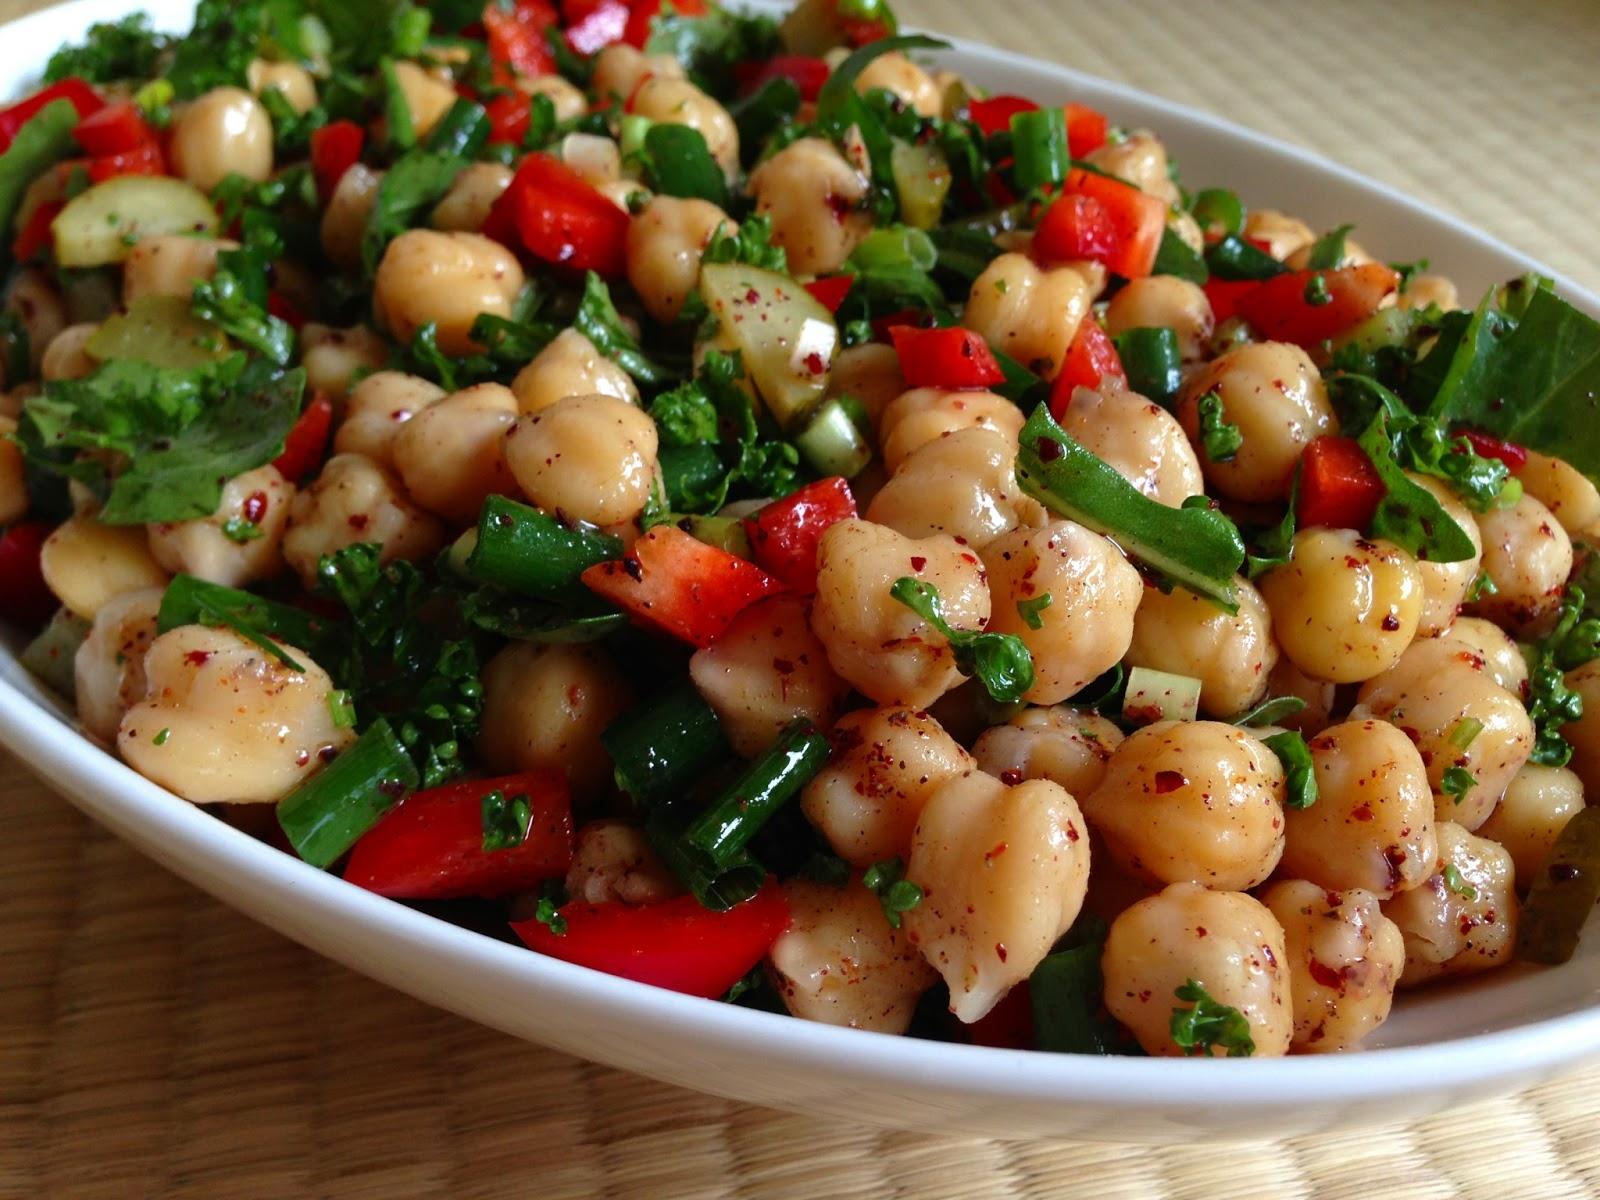 Nohut Salatası Oktay Ustadan 5